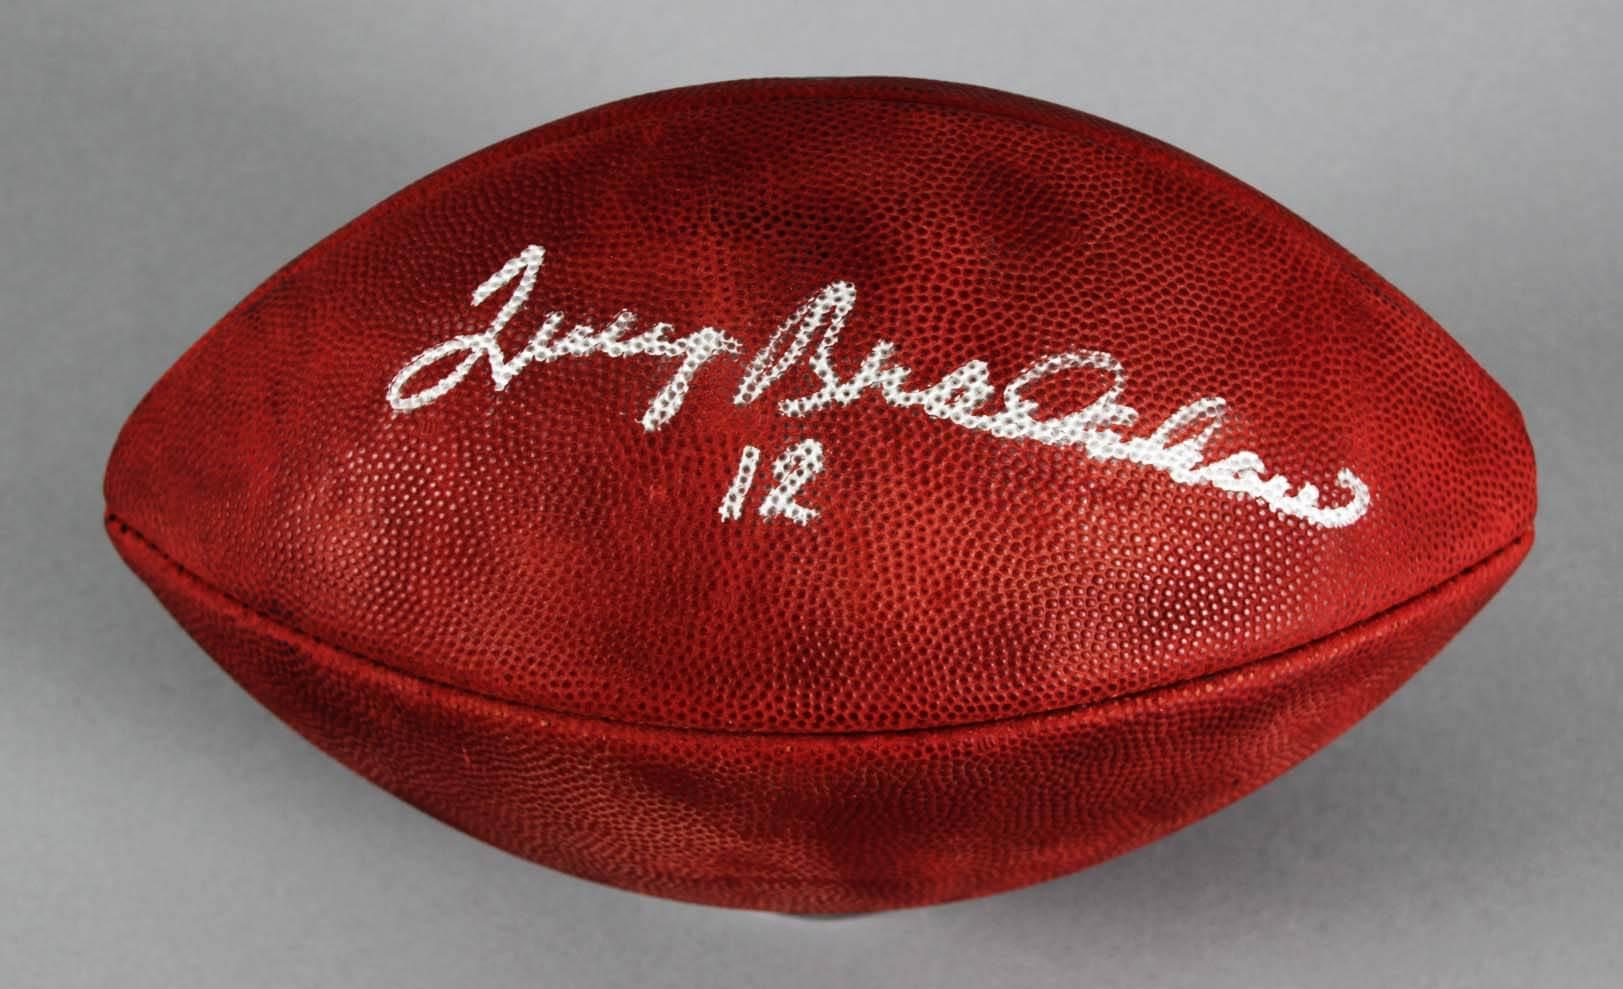 Terry Bradshaw Signed Football Steelers - COA Beckett